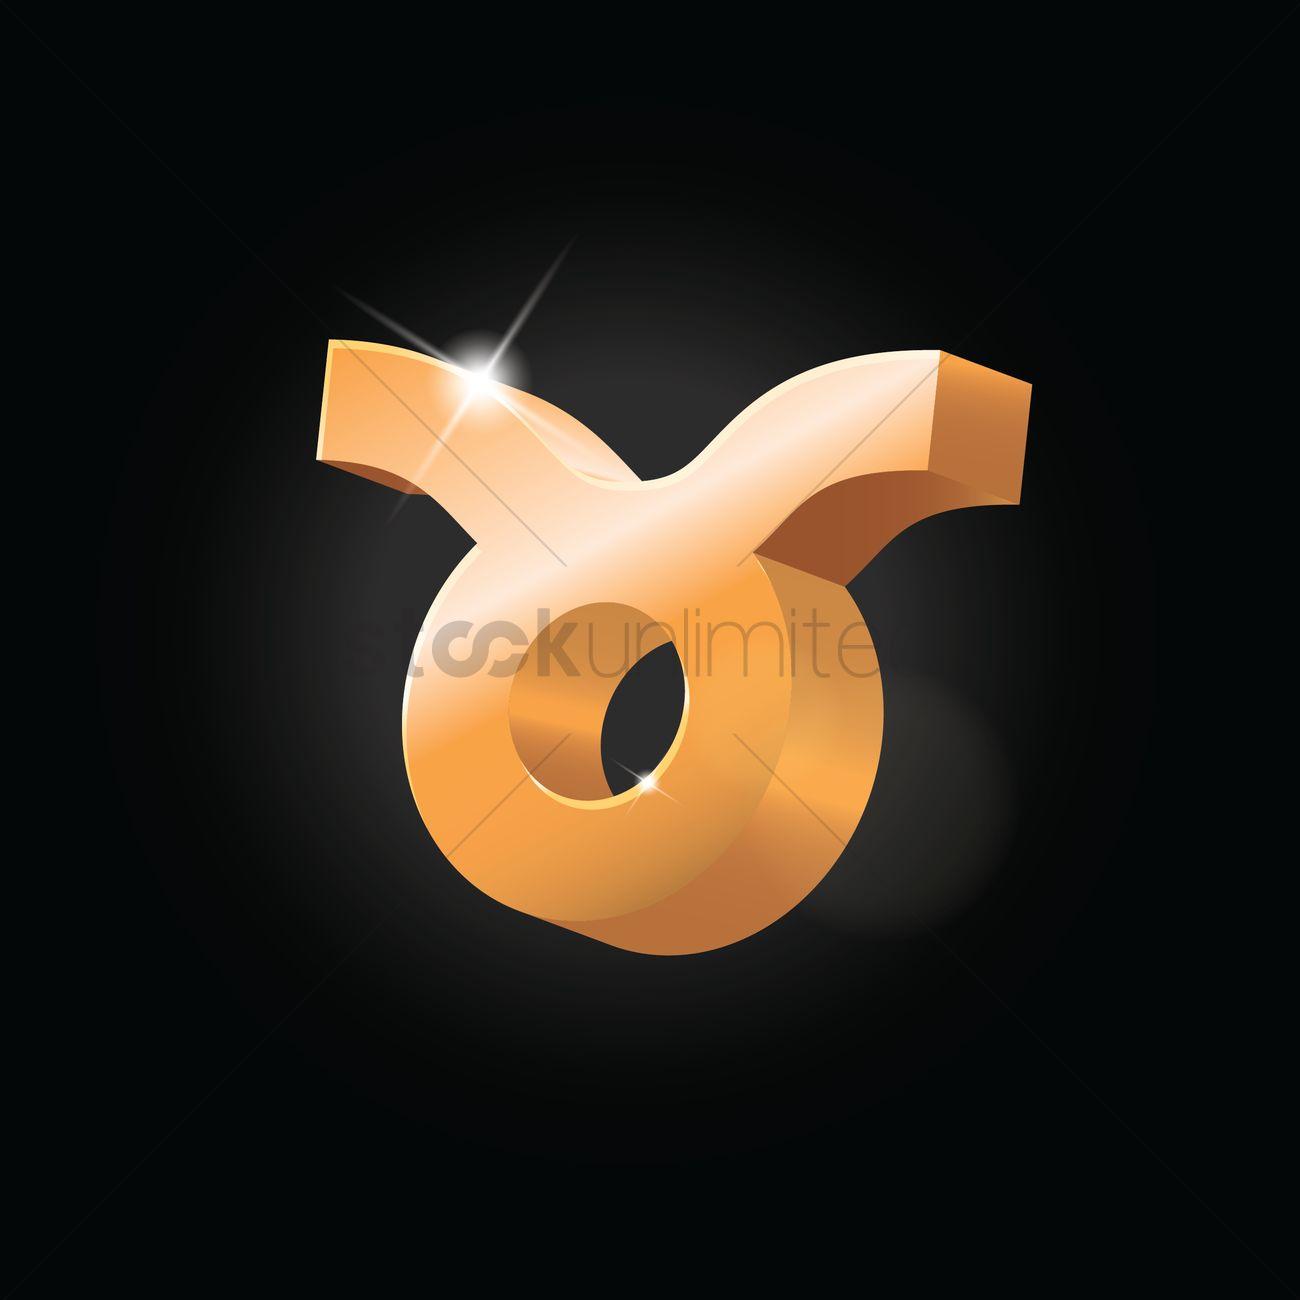 Taurus Zodiac Symbol Vector Image 1606273 Stockunlimited